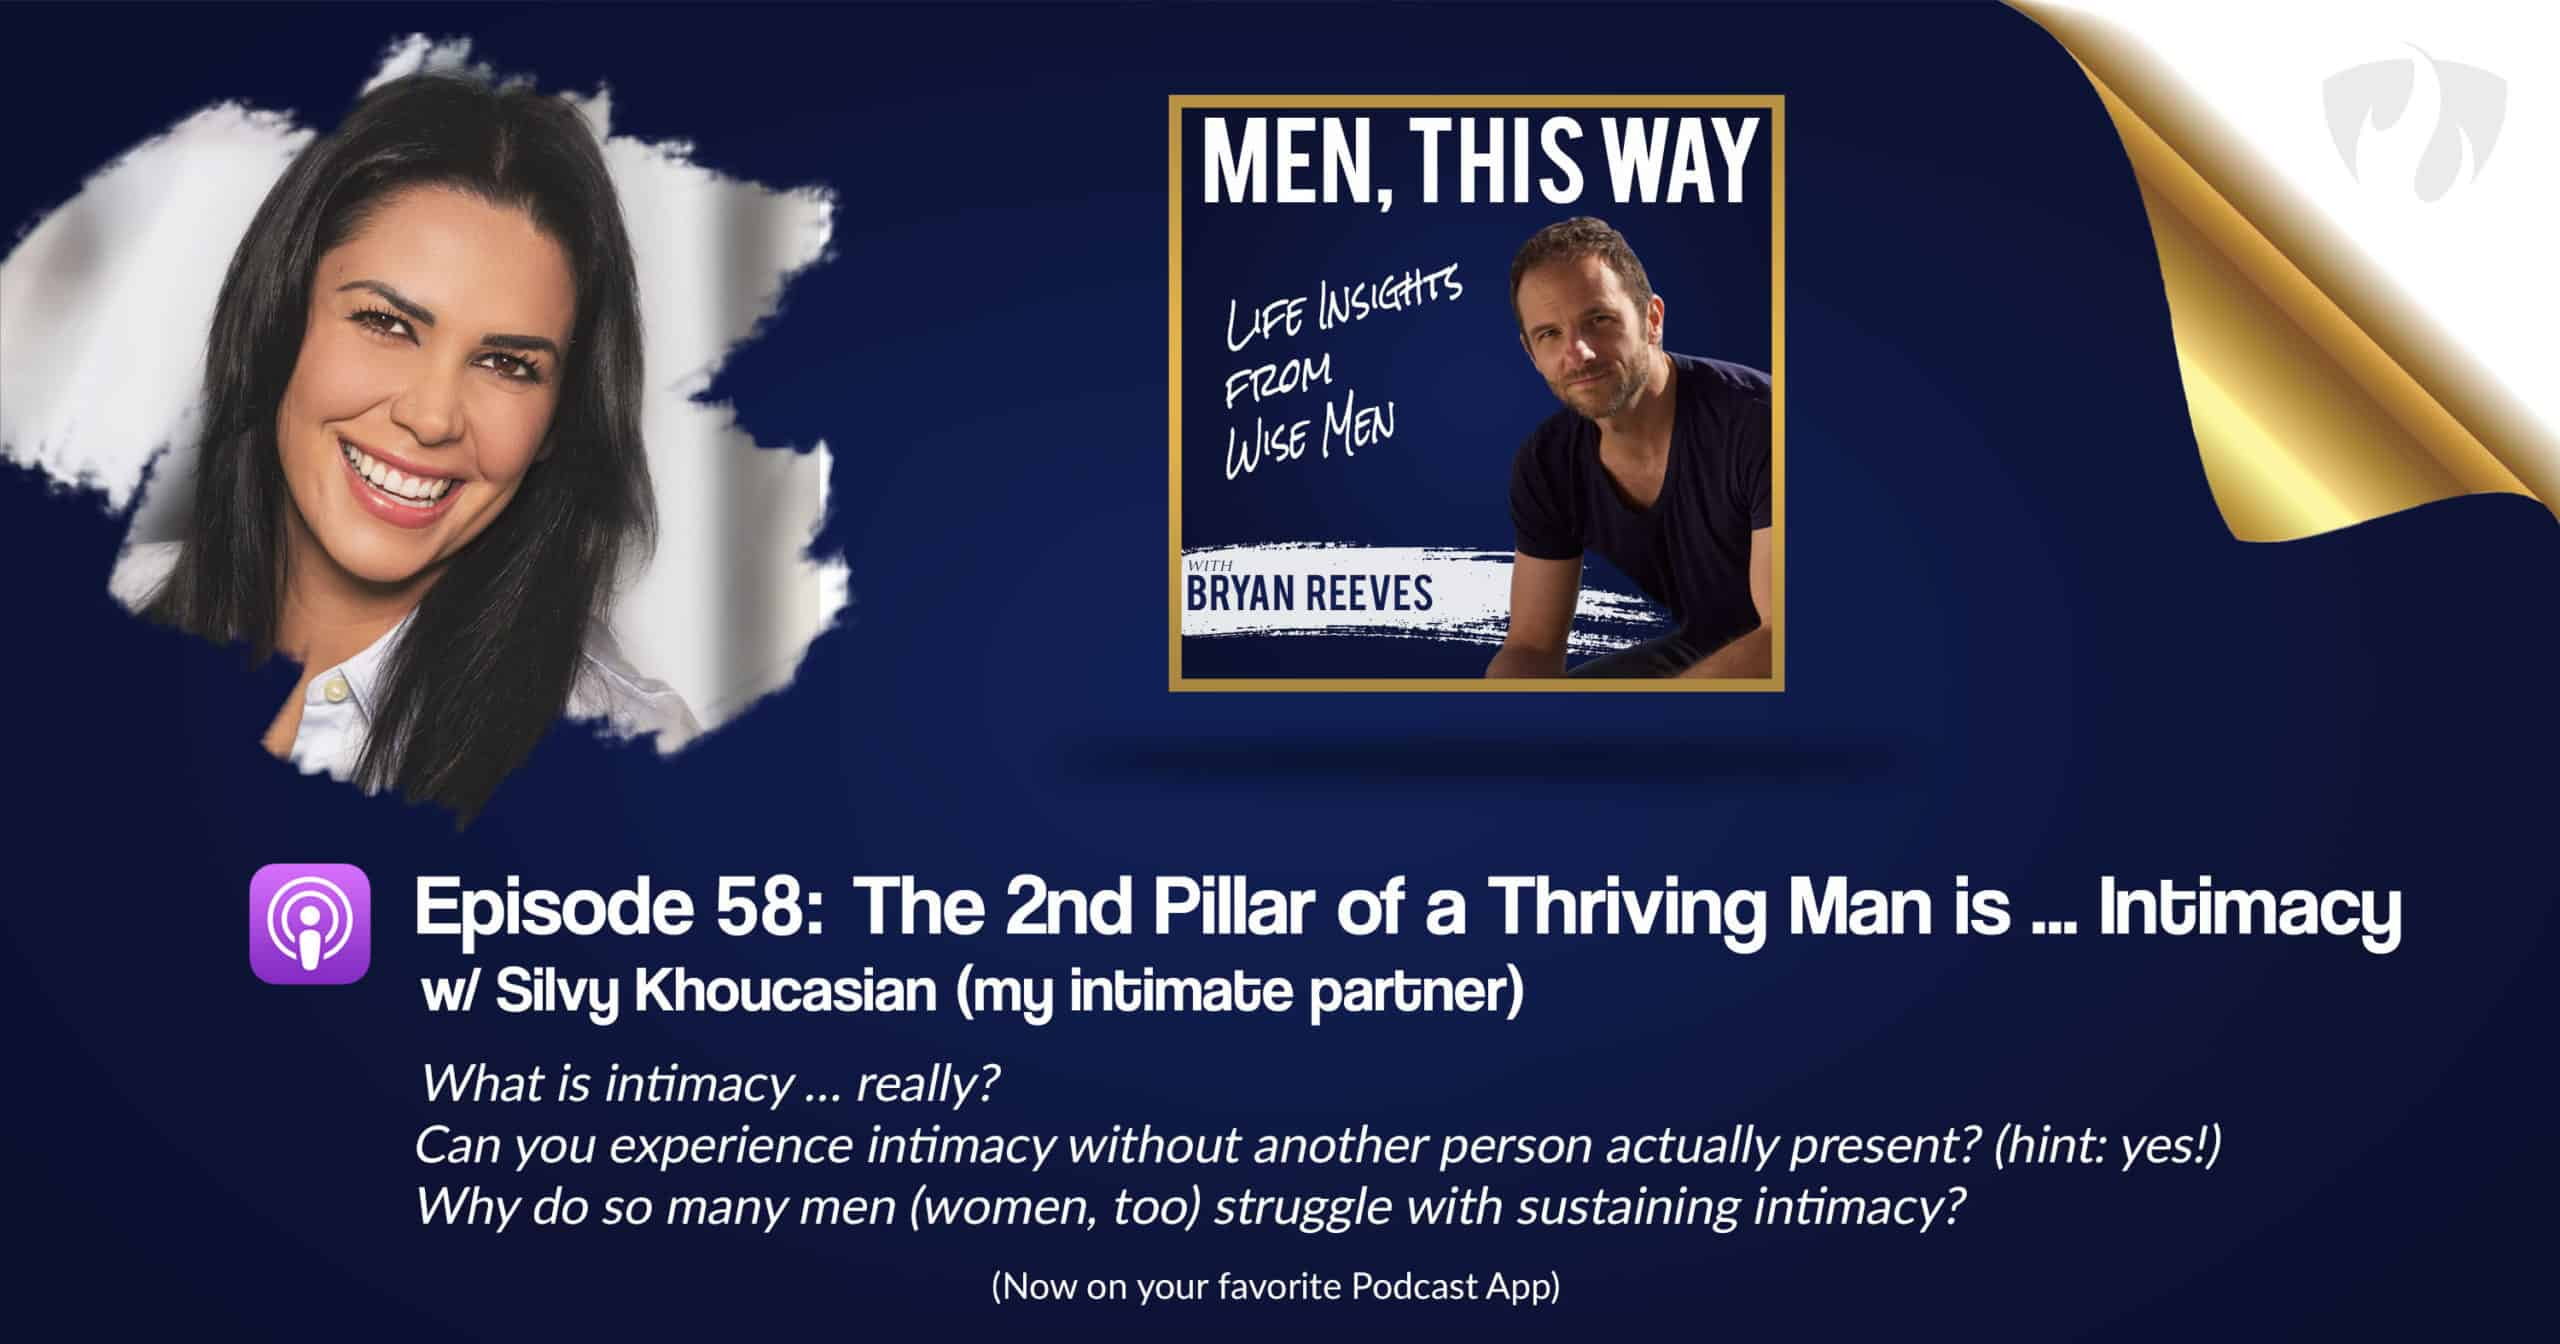 Men This Way GUEST Banner Silvy Khoucasian